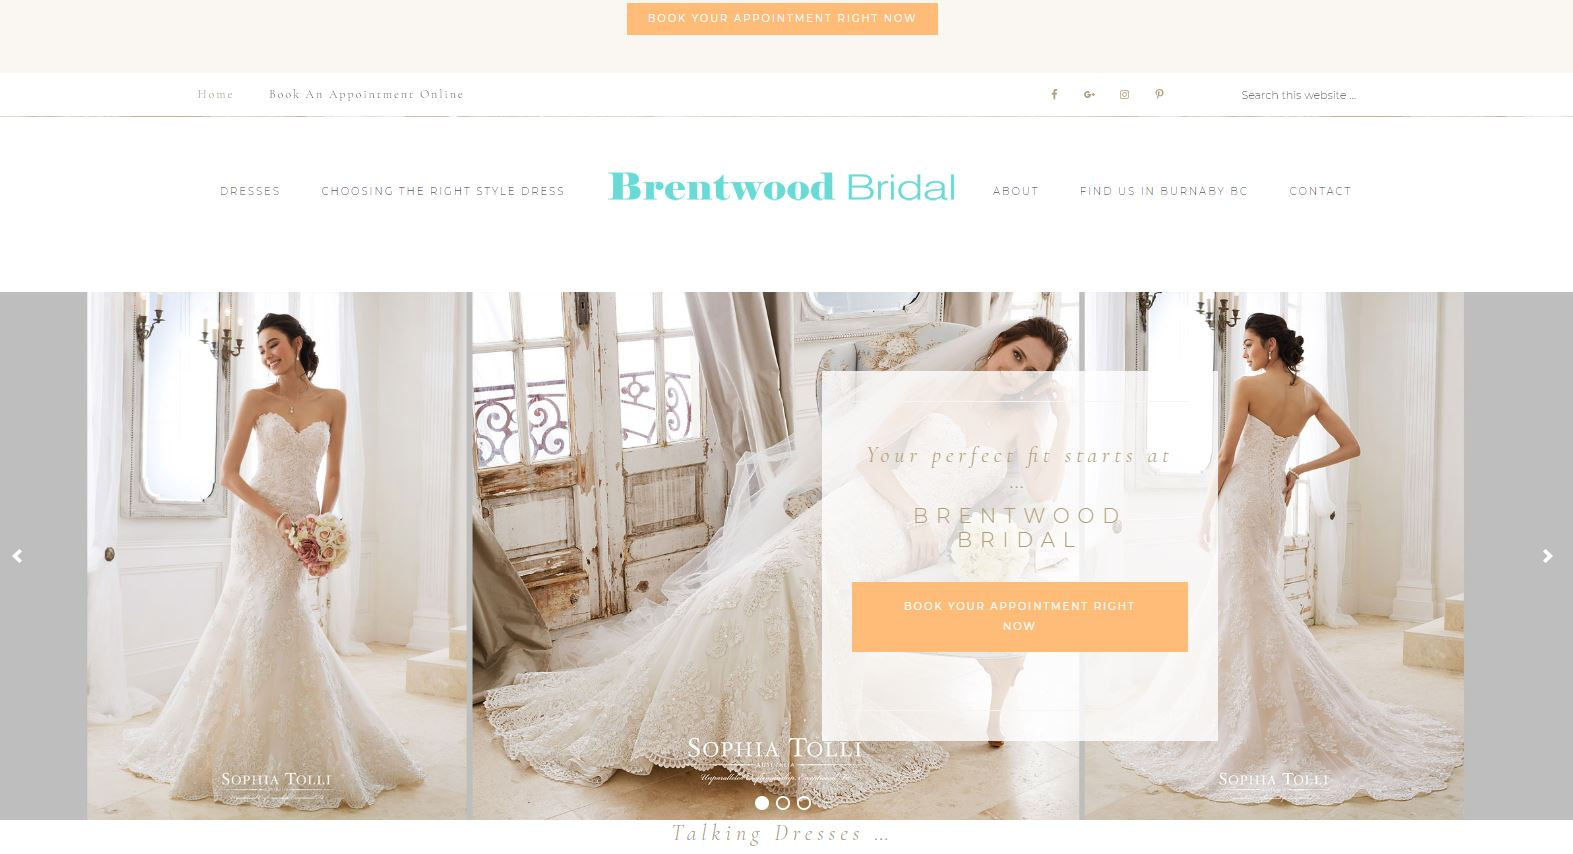 Brentwood Bridal